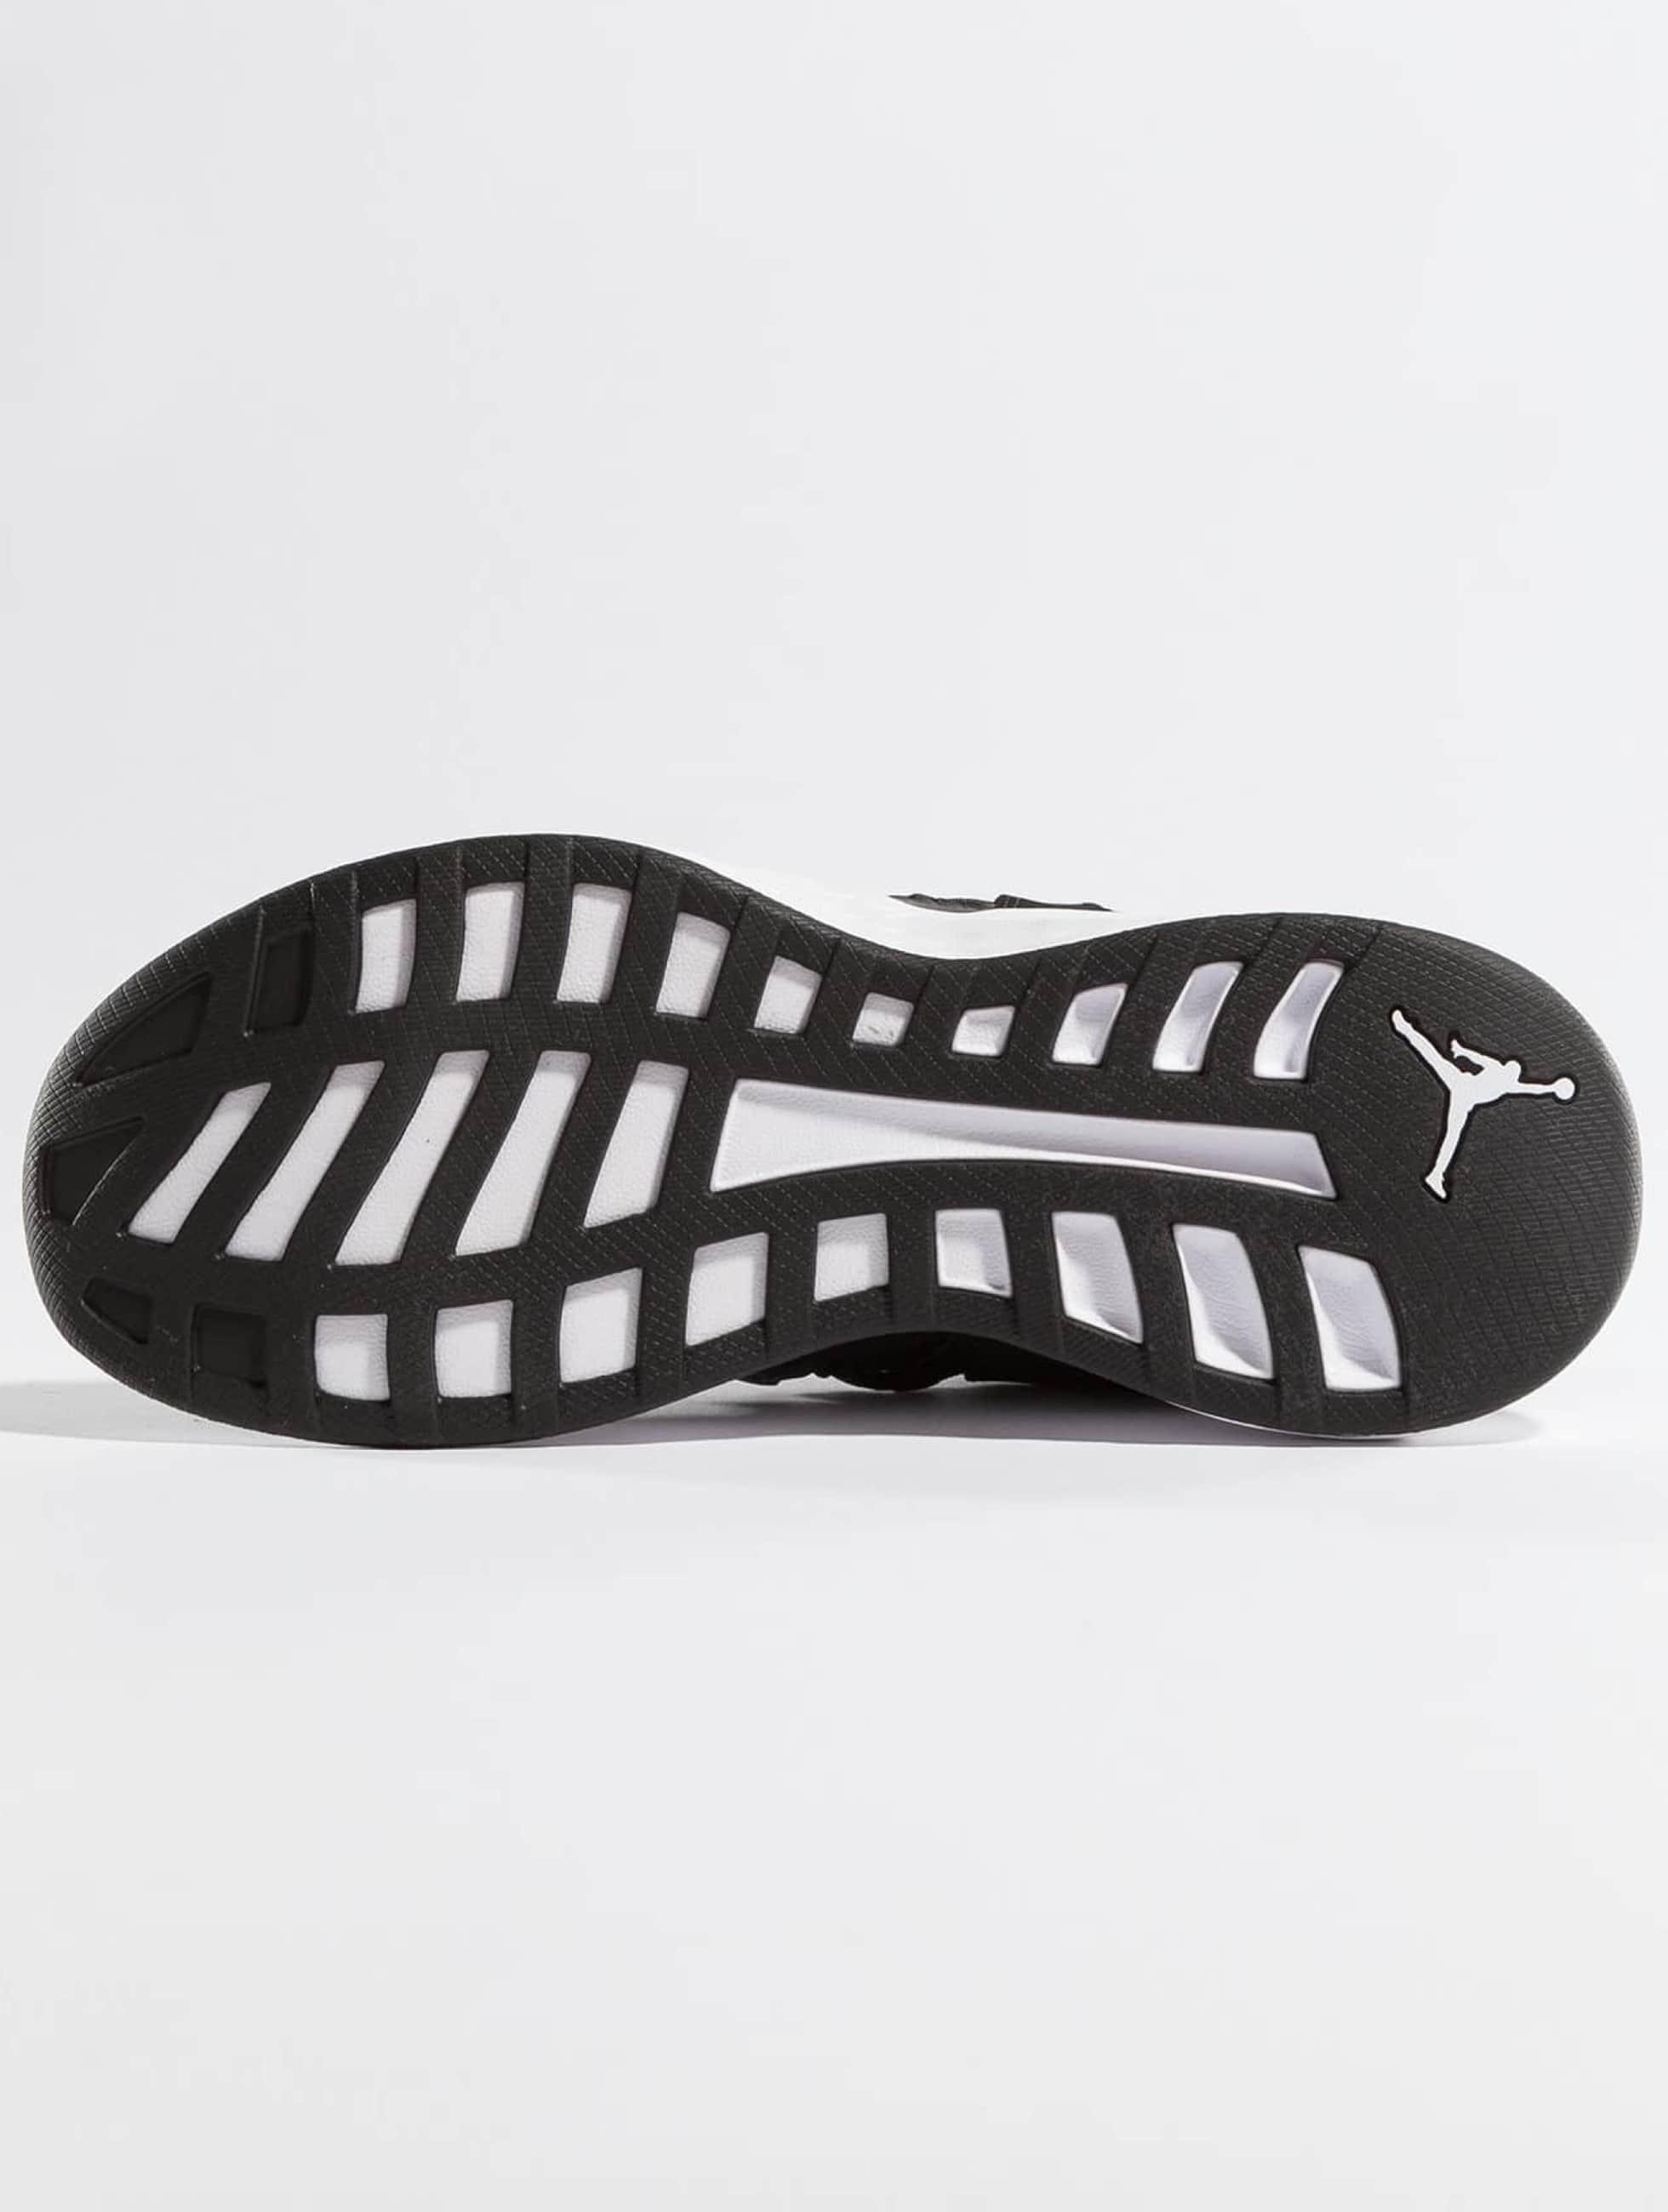 Jordan Sneakers Formula 23 Low èierna